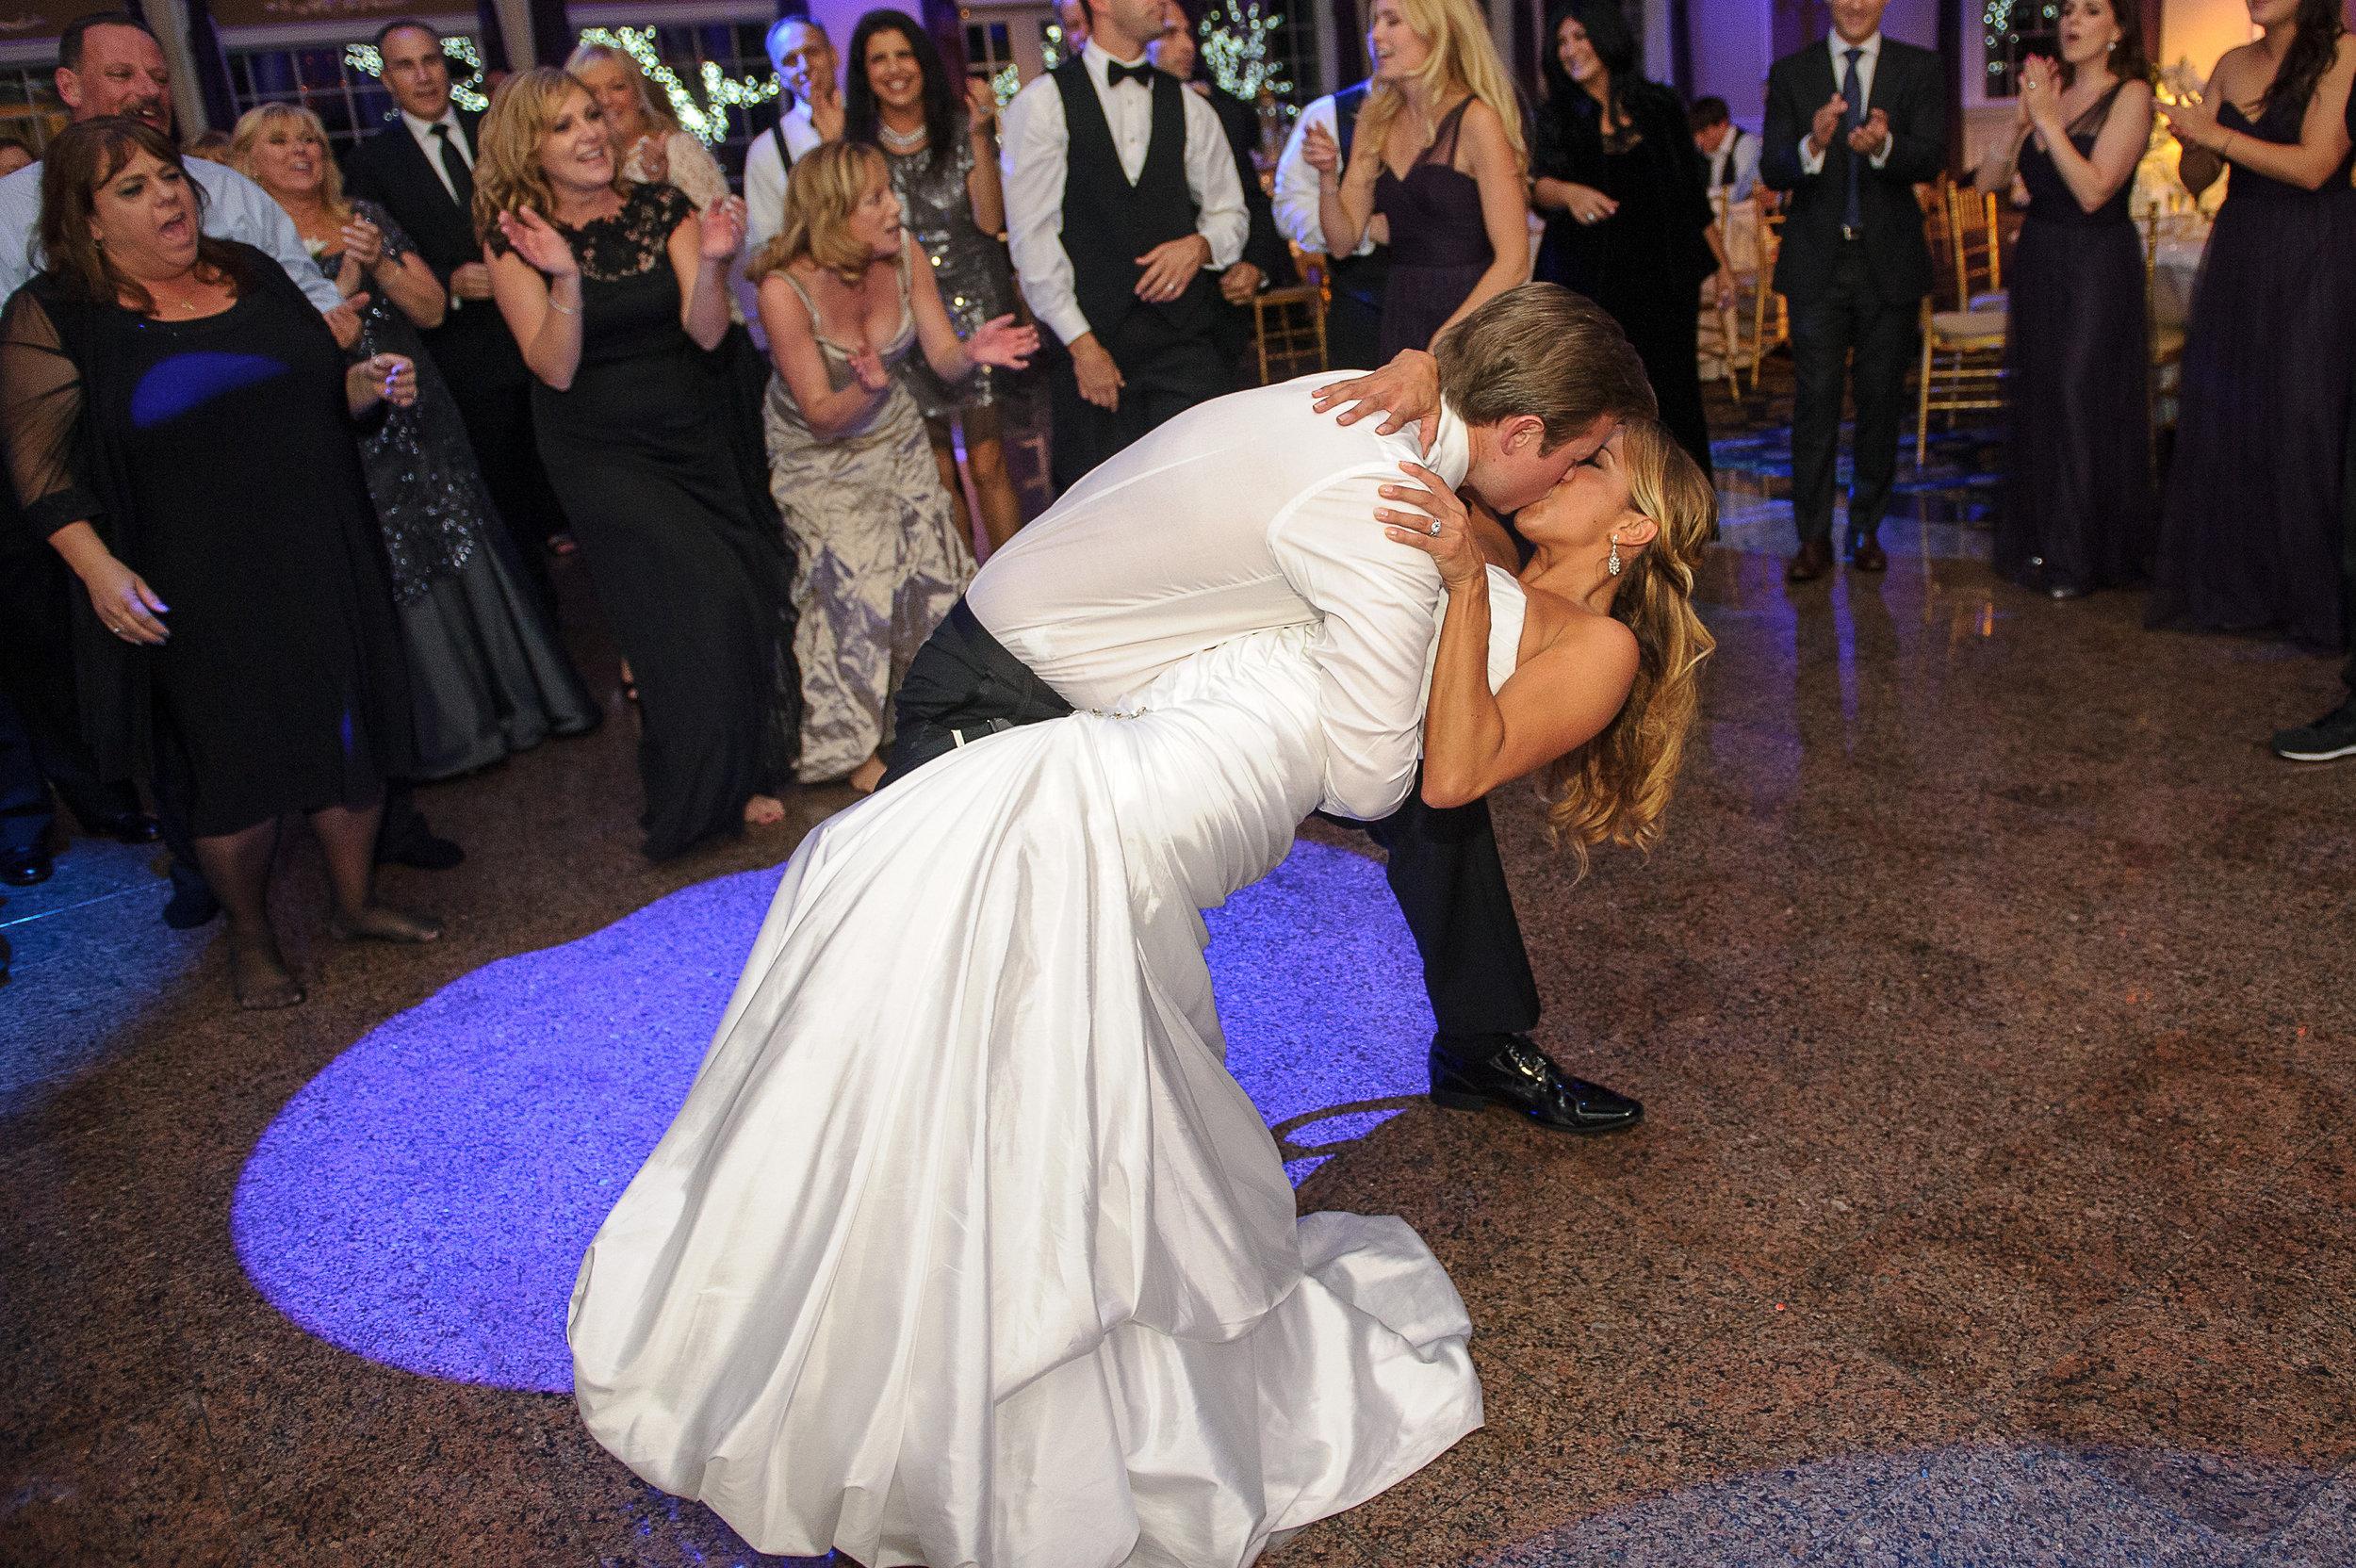 Ceci_New_York_Custom_Invitation_ New_Jersey_Wedding_Luxury_Personalized_Ceci_Style_Bride_Foil_Stamping131.JPG